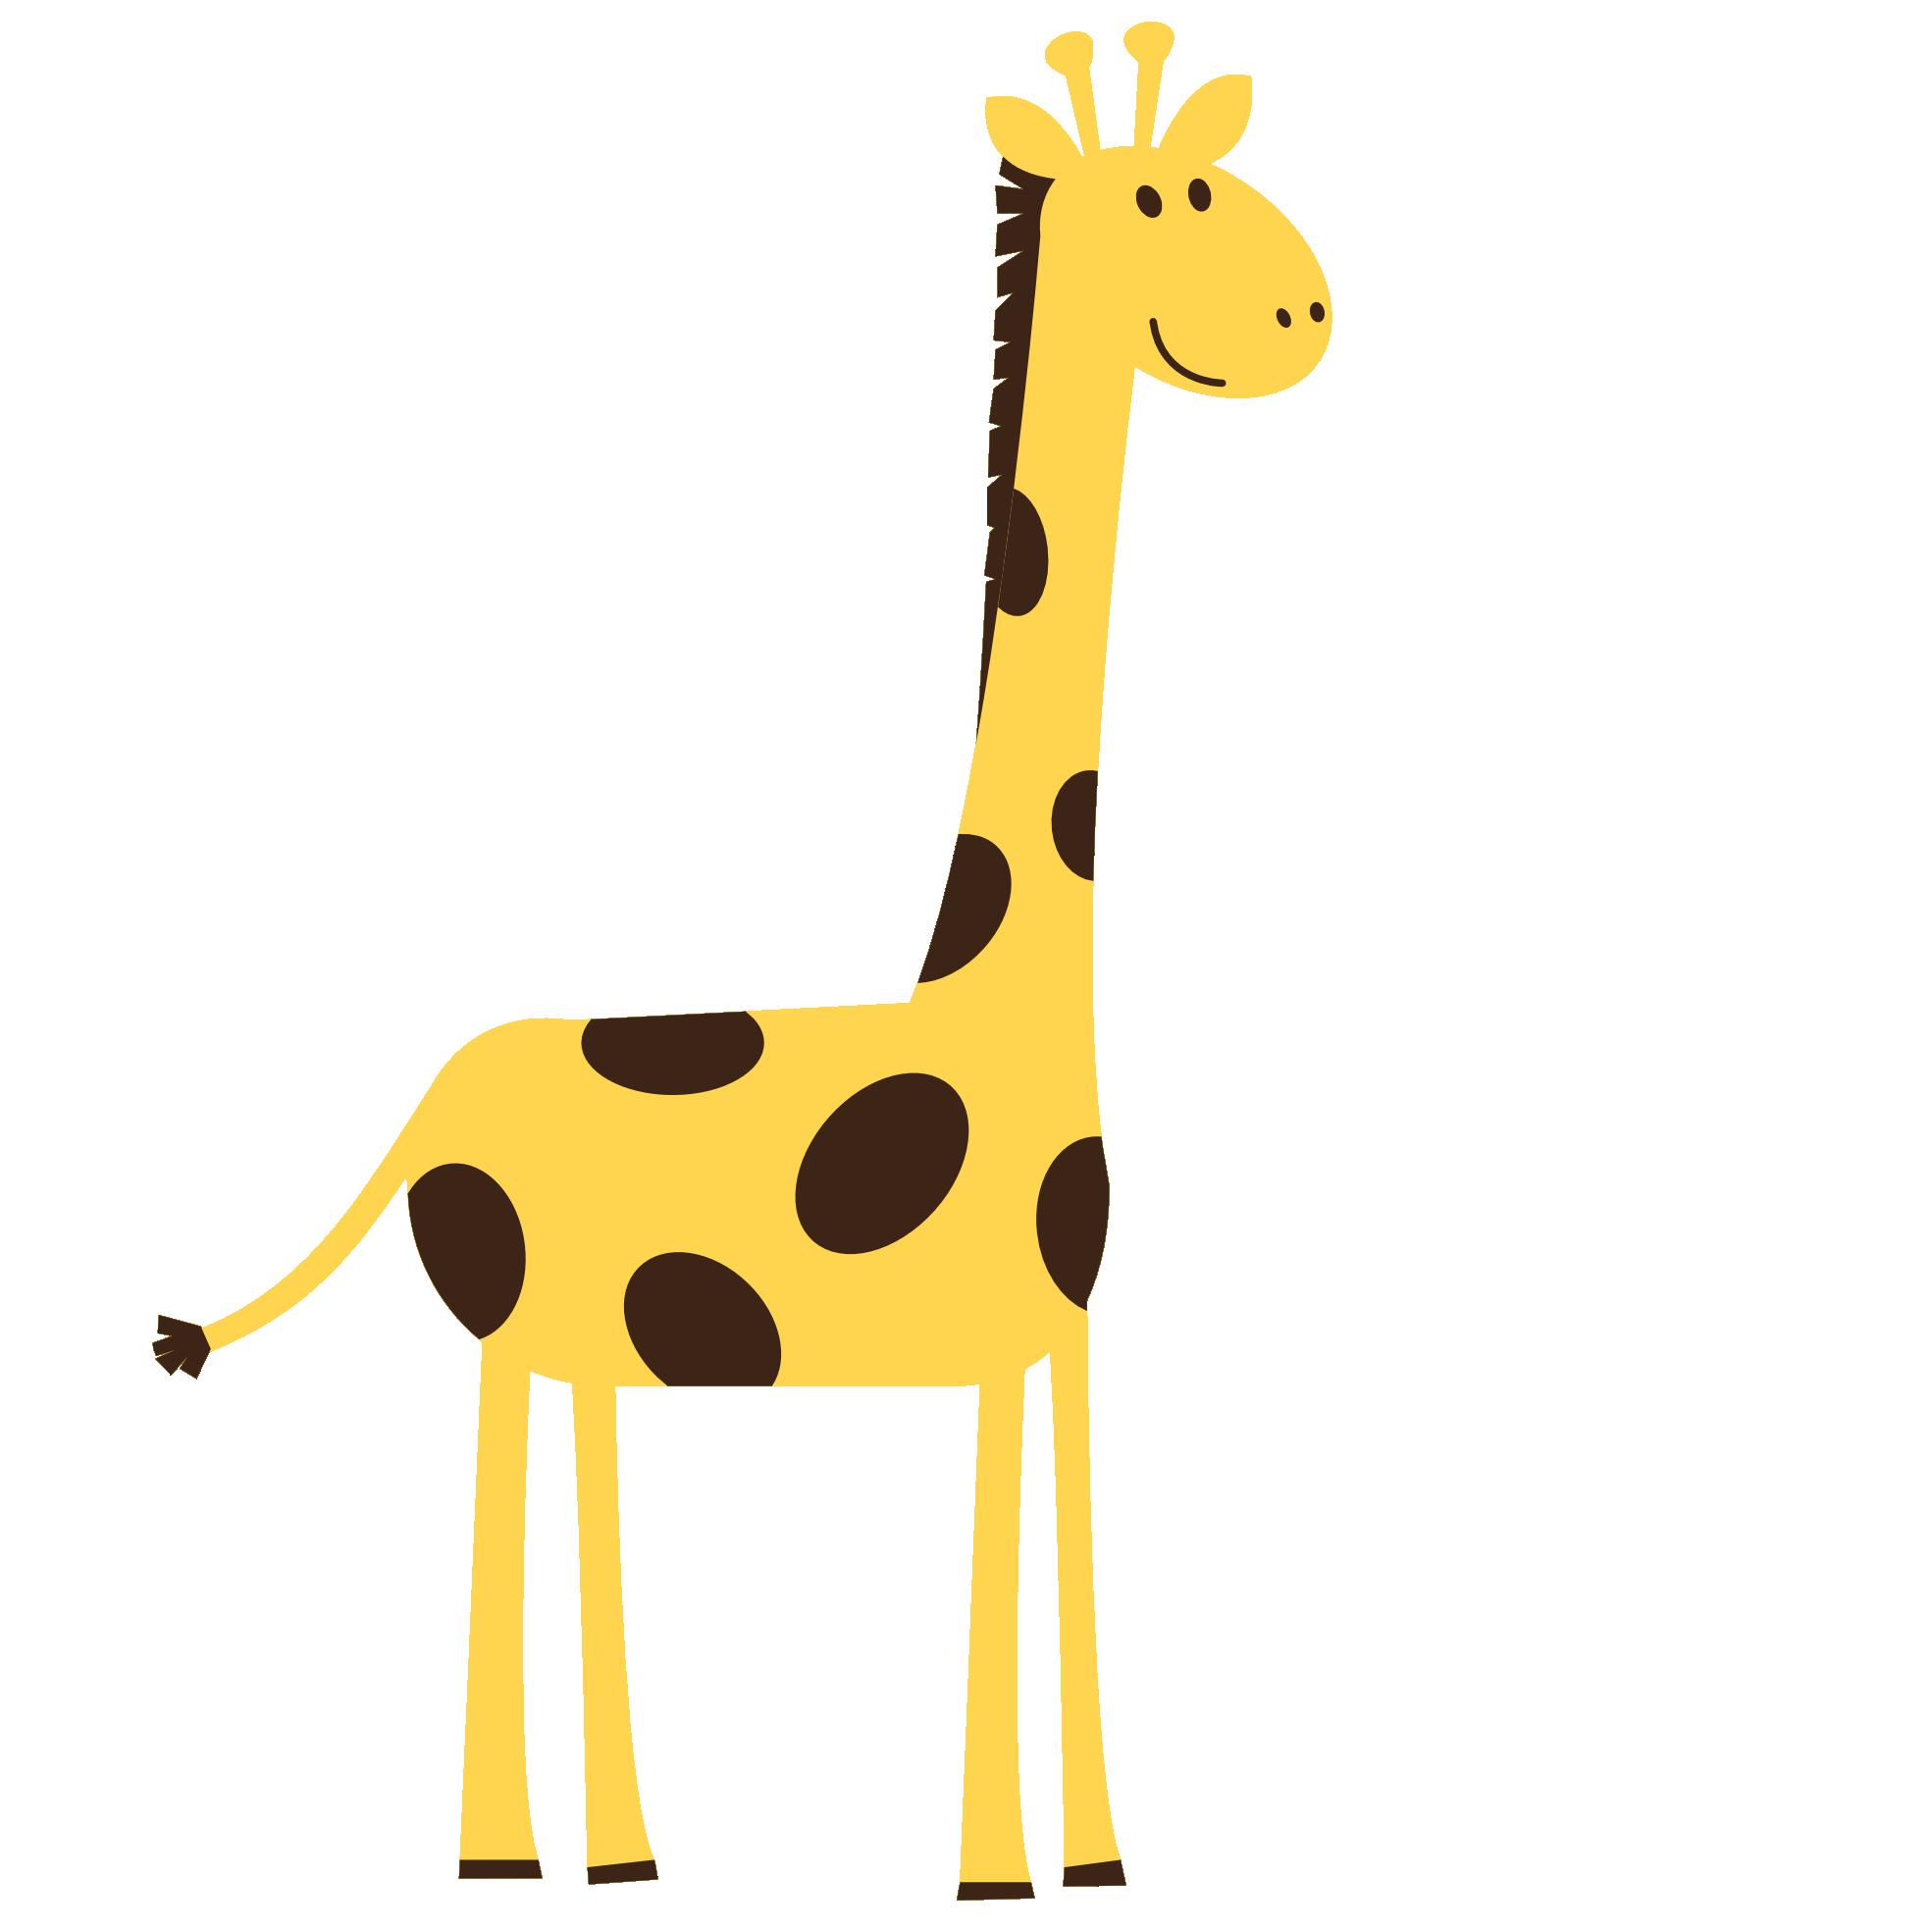 1969x1969 Clip Art Colorful Animal Giraffe Vfx Solidarity